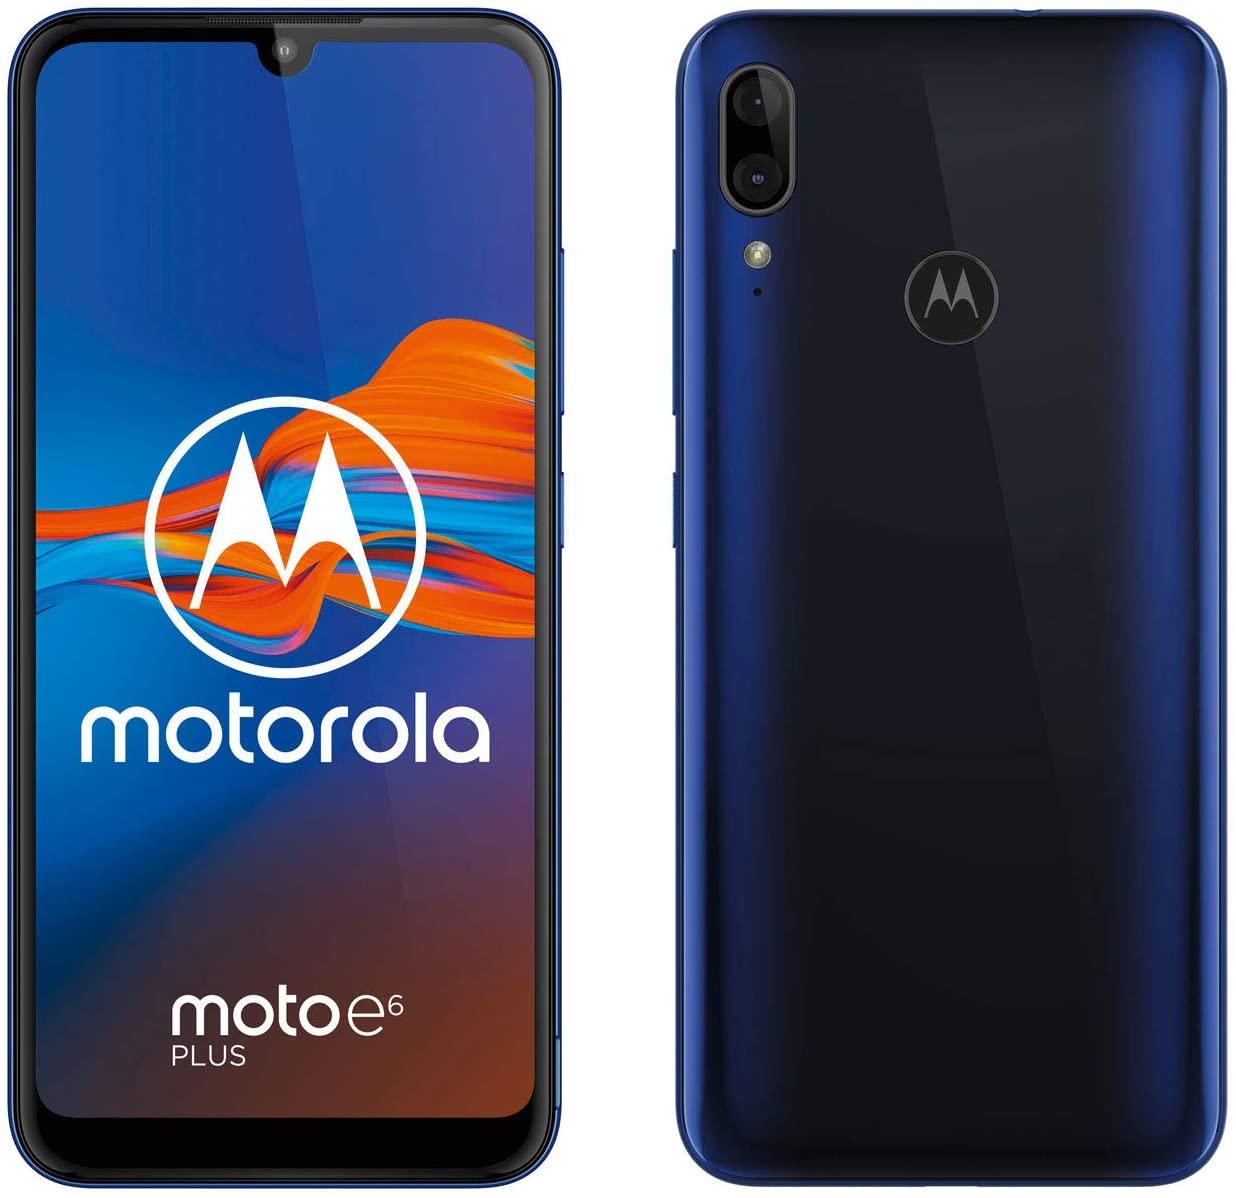 "Motorola Moto E6 Plus (6,1"", Android 9.0, Dual SIM) Azul + funda"